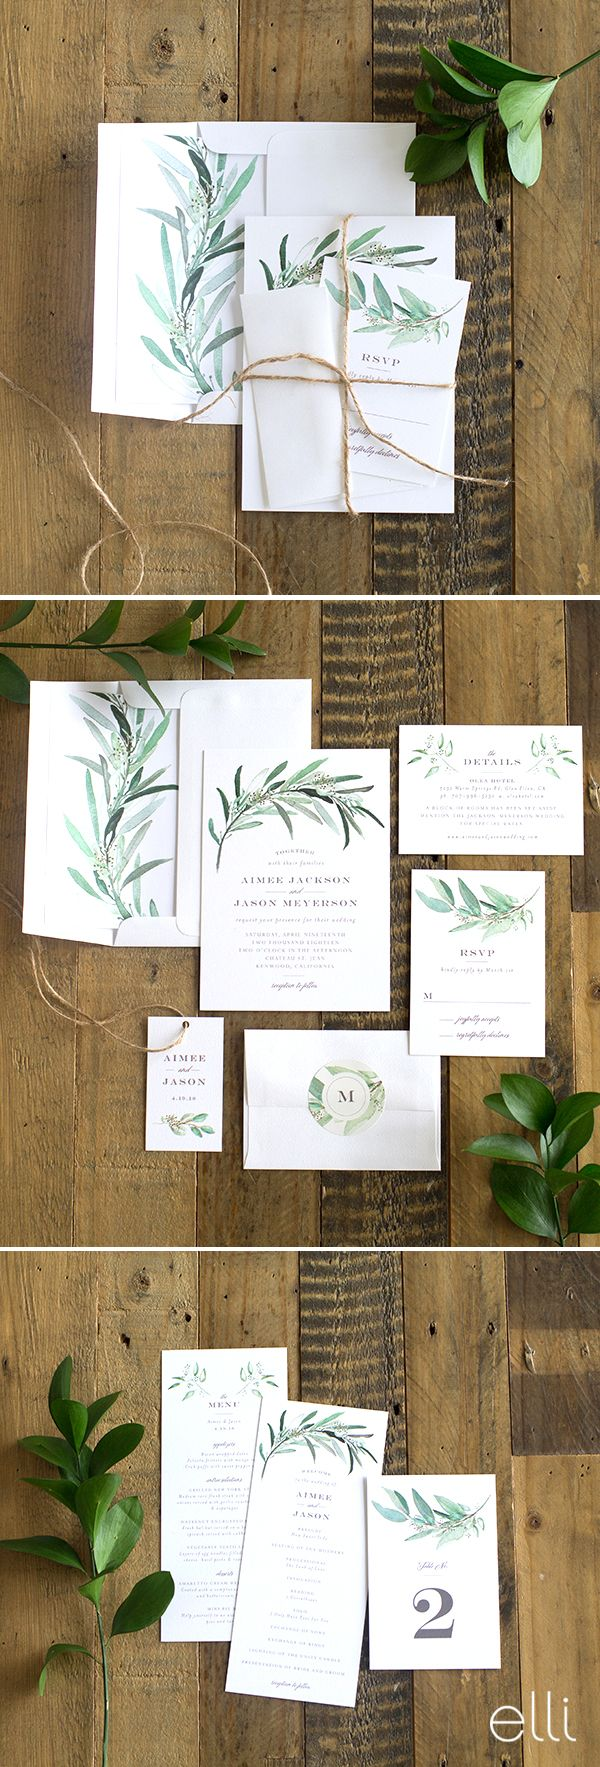 wedding invitation suite wedding invitation suites Gorgeous lush greenery wedding invitation suite